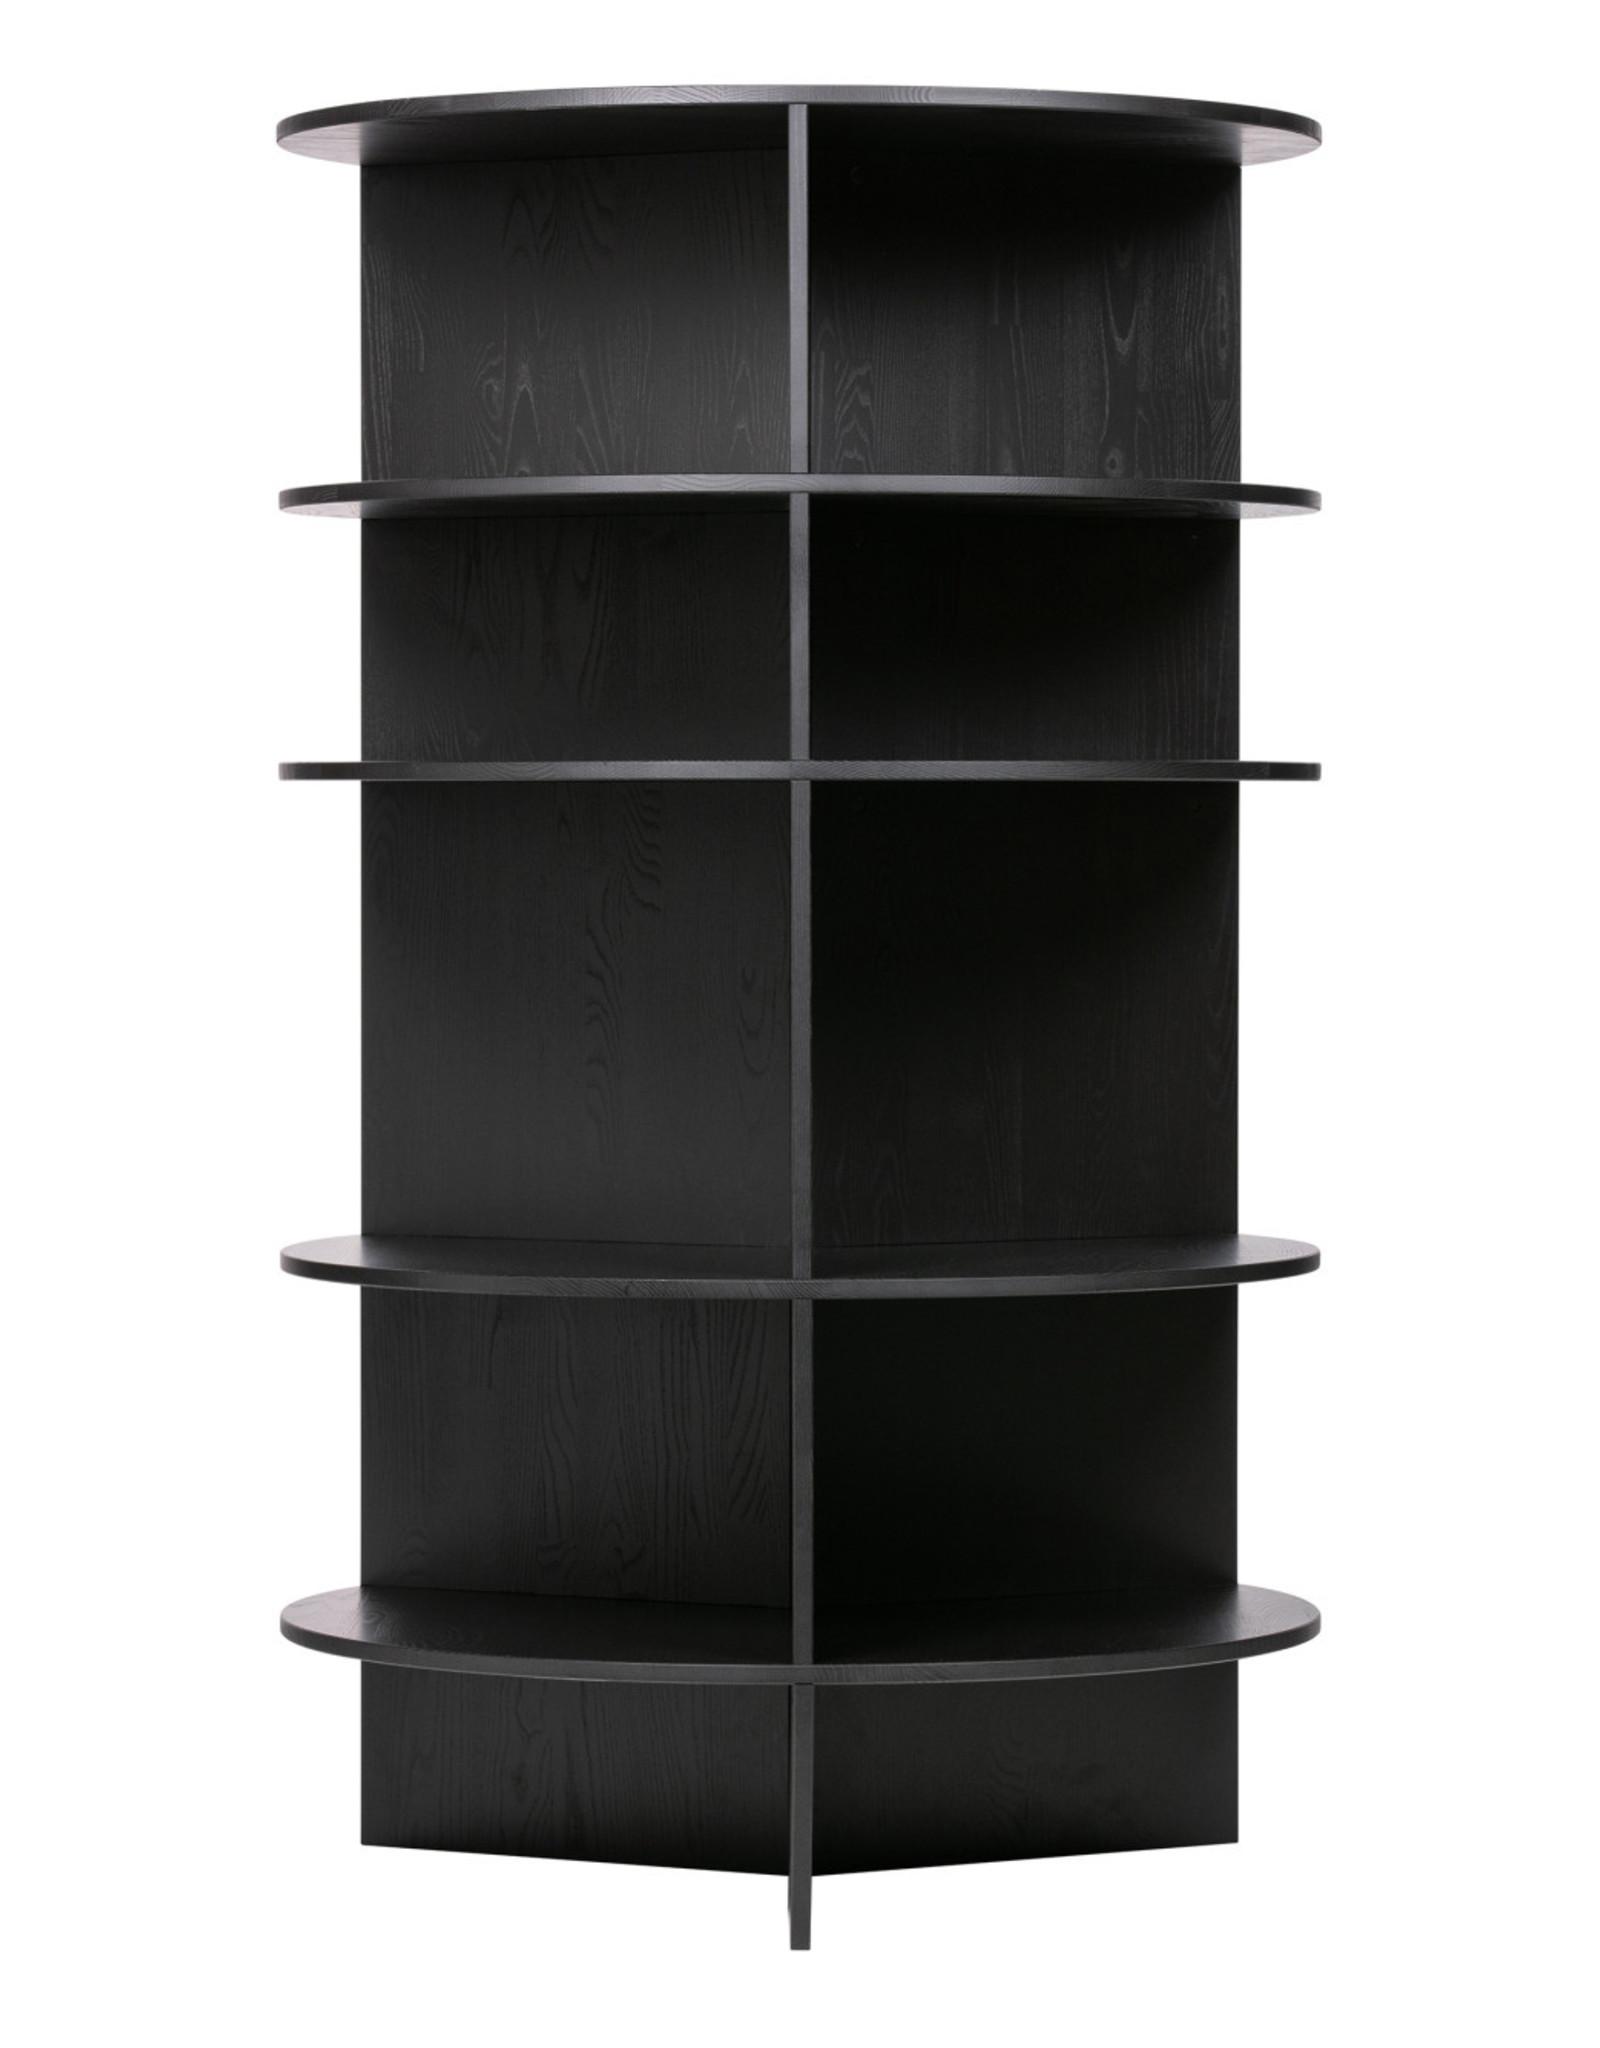 Ronde kast 'The Tower' - zwart grenenhout